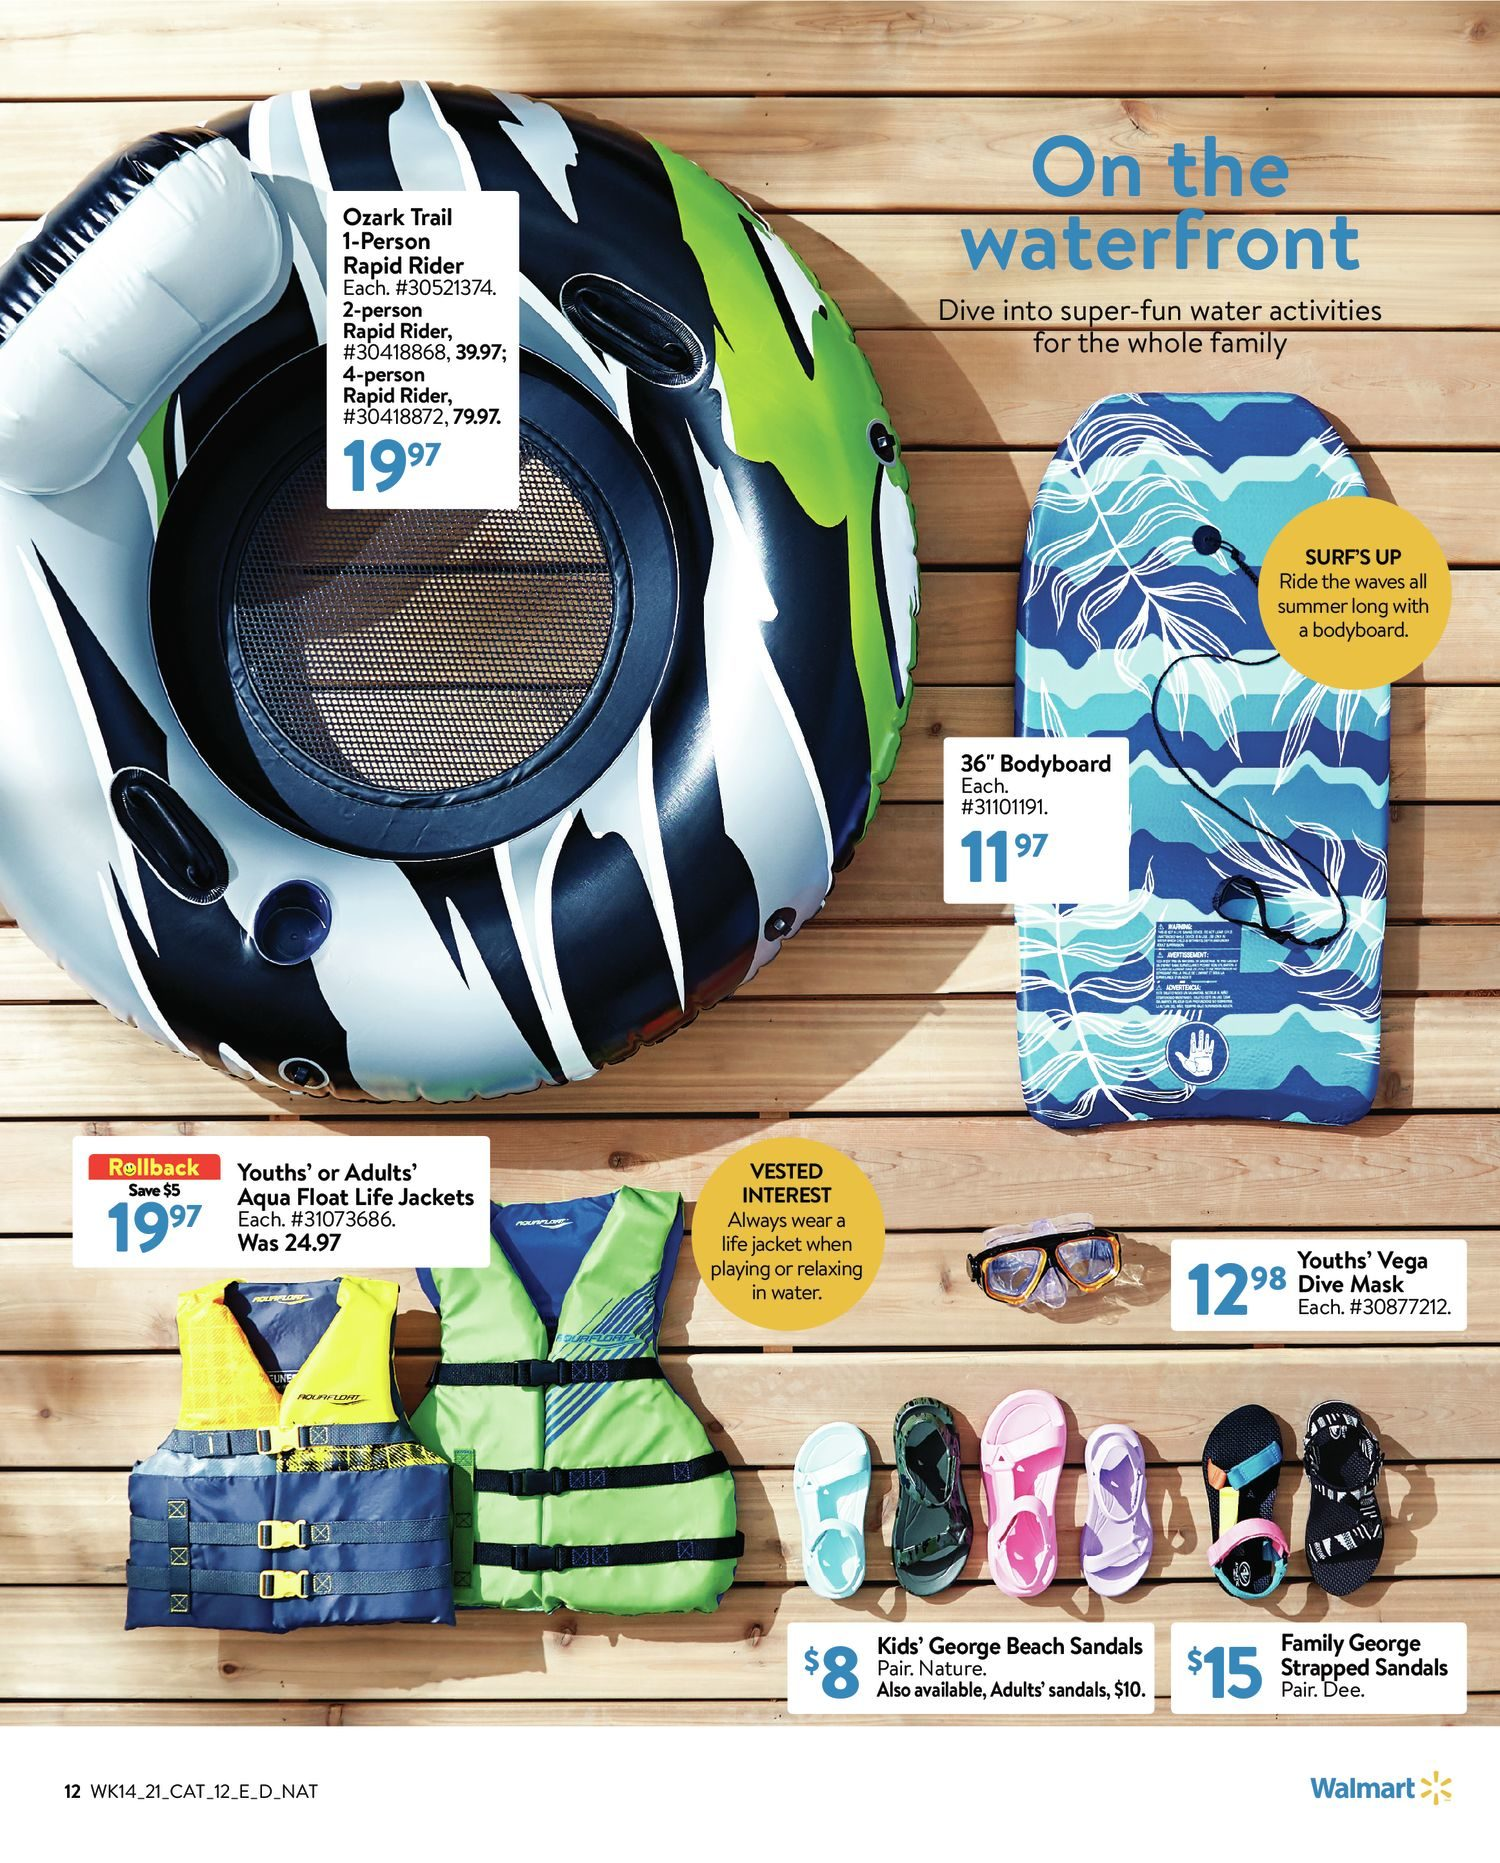 Walmart - Weekends Book - Page 12